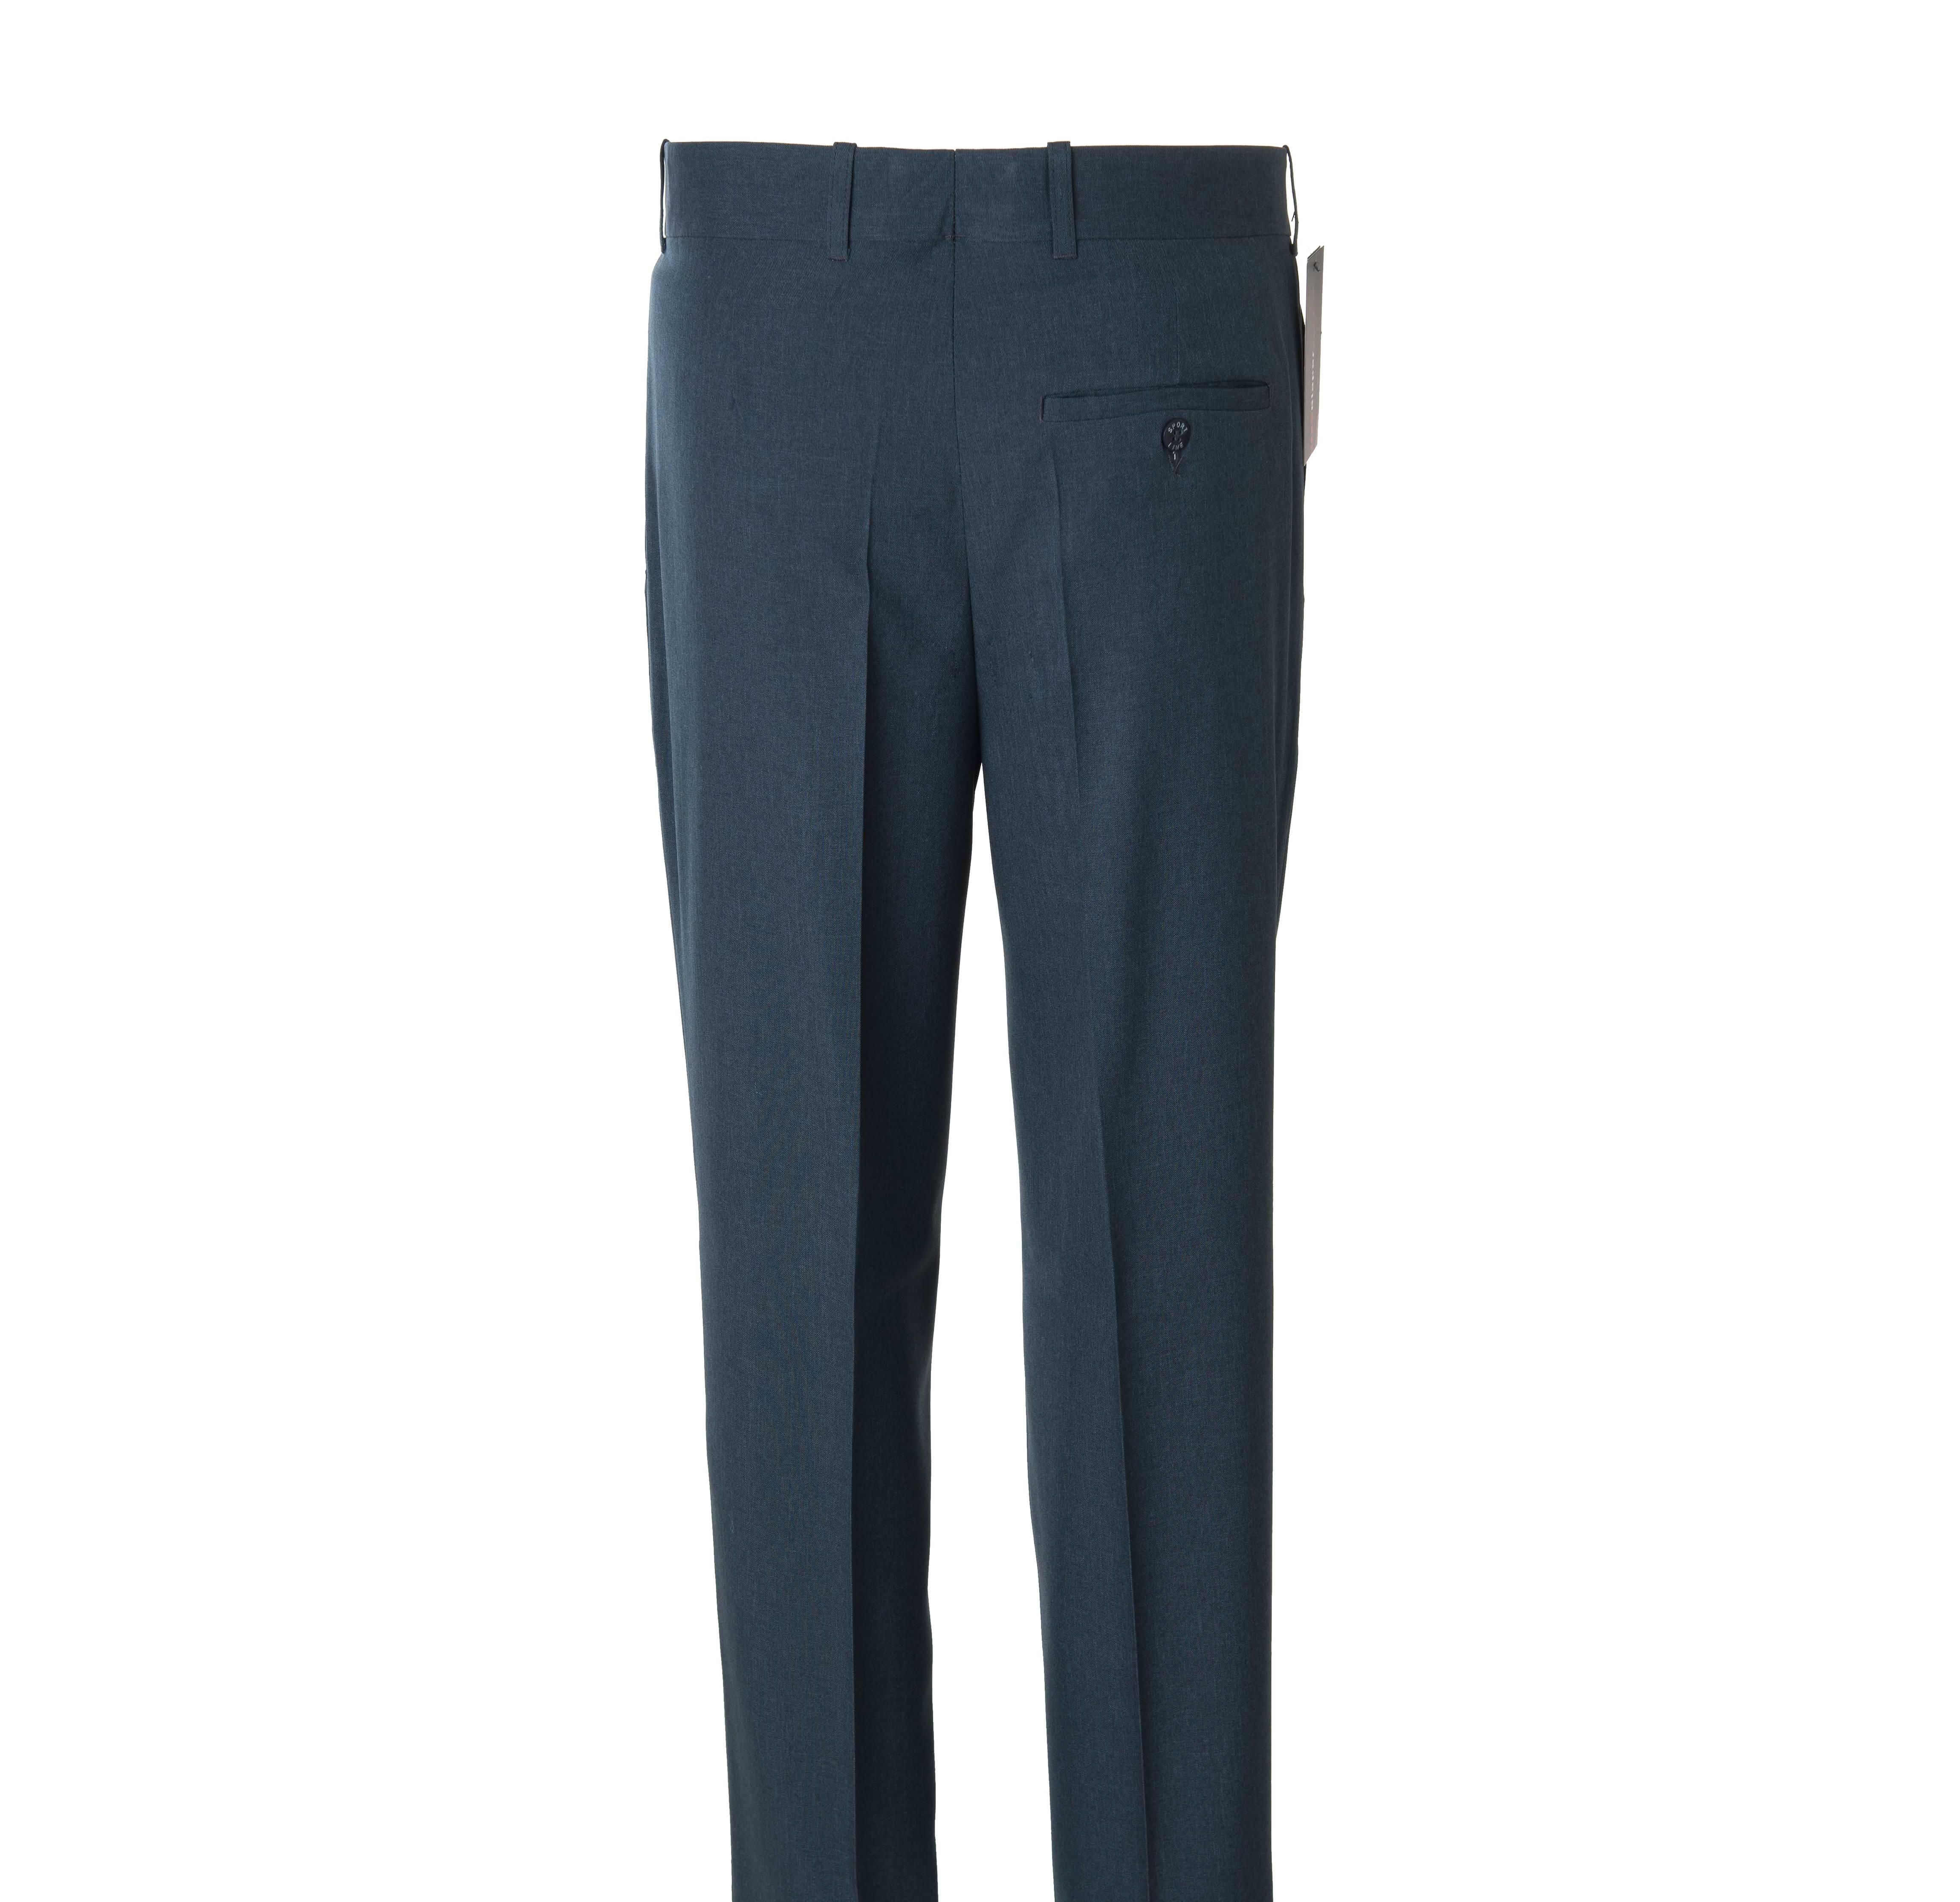 Pantalon De Vestir Una Pinza Para Caballero Pantalones Blaper